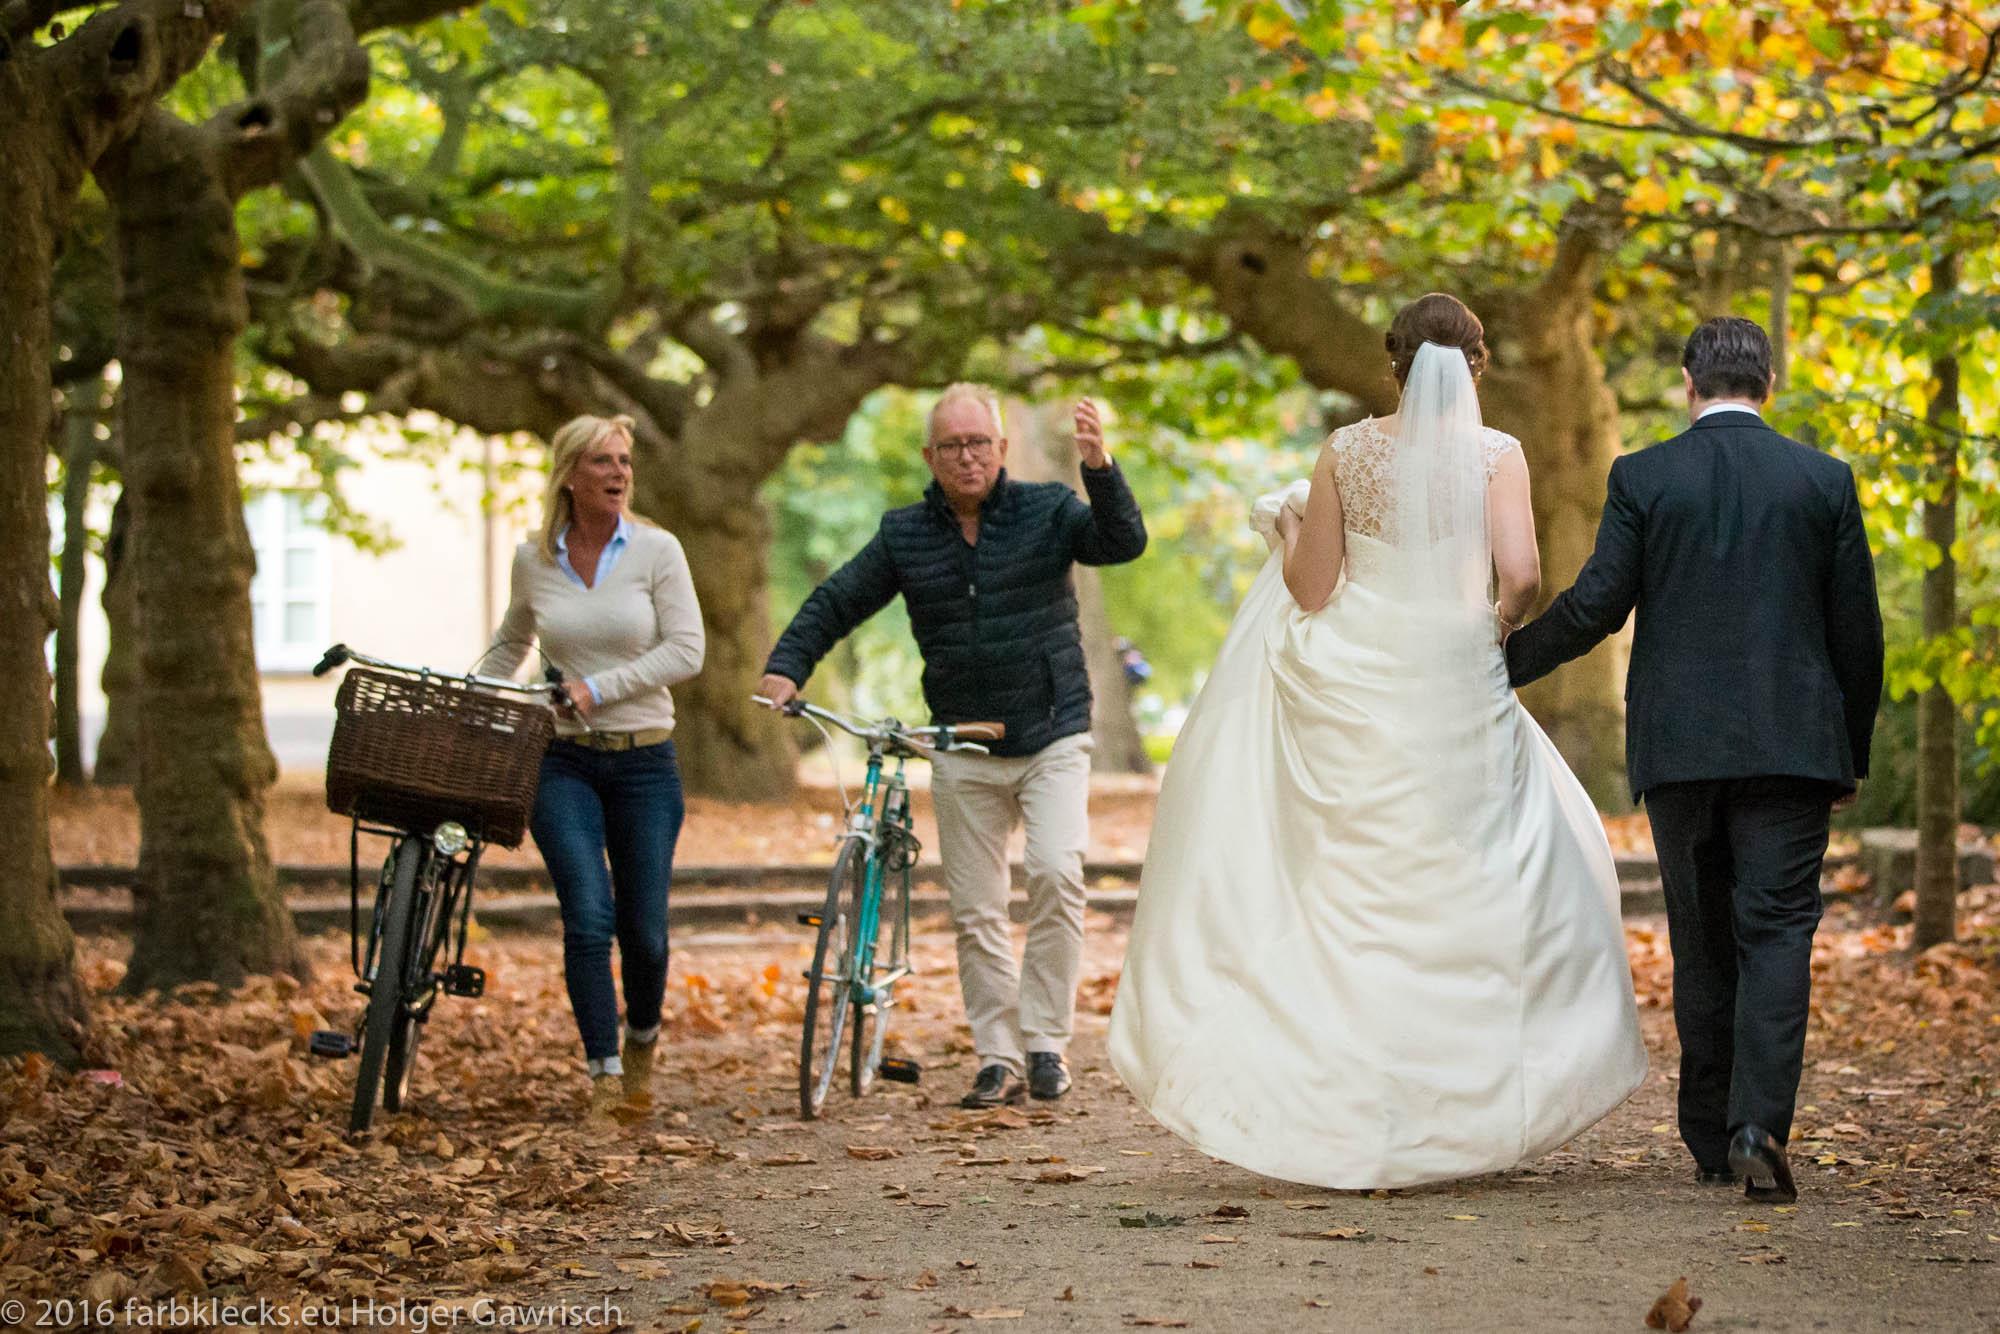 Brautpaar mit Passanten